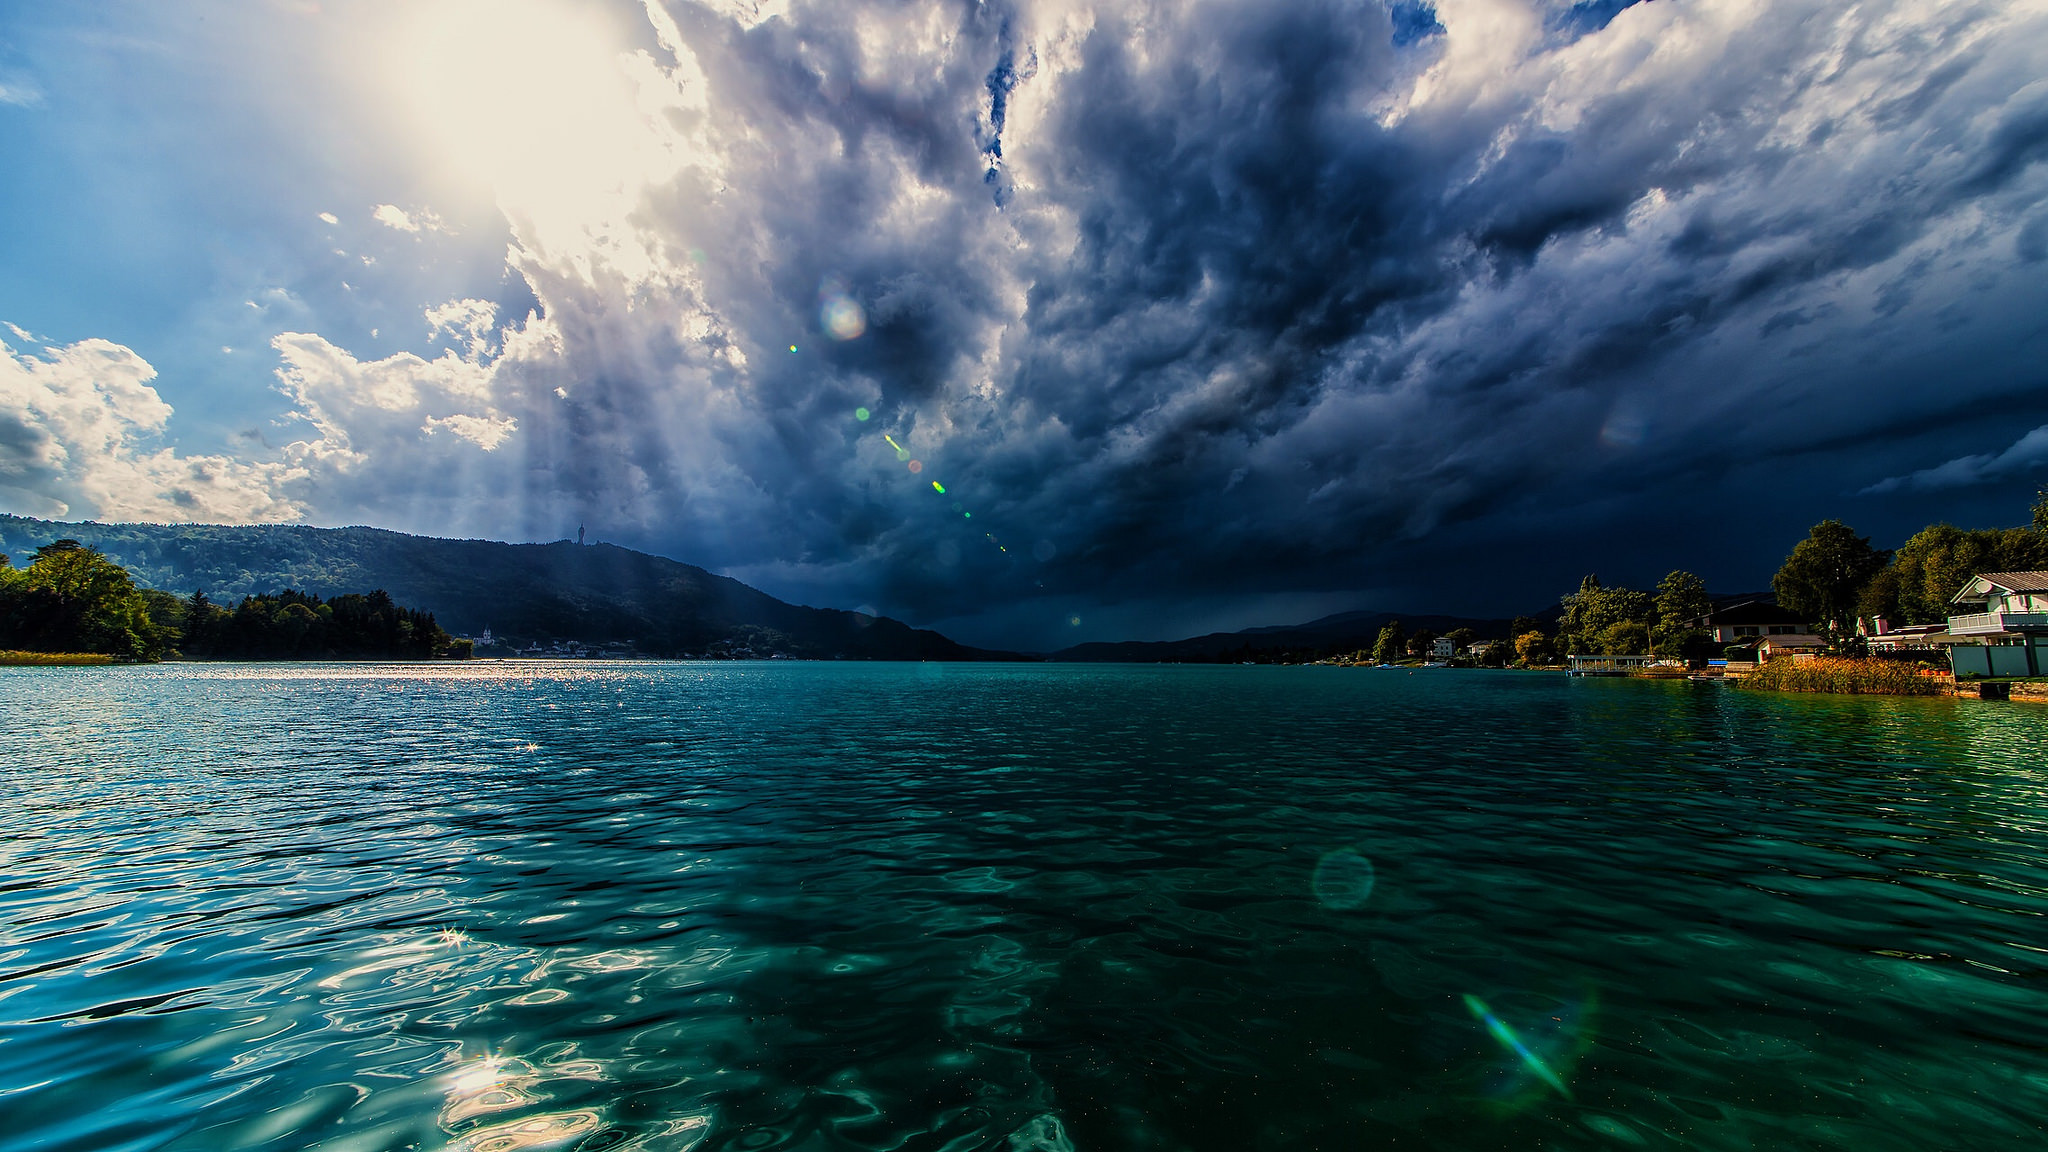 Una increíble vista del mar - 2048x1152